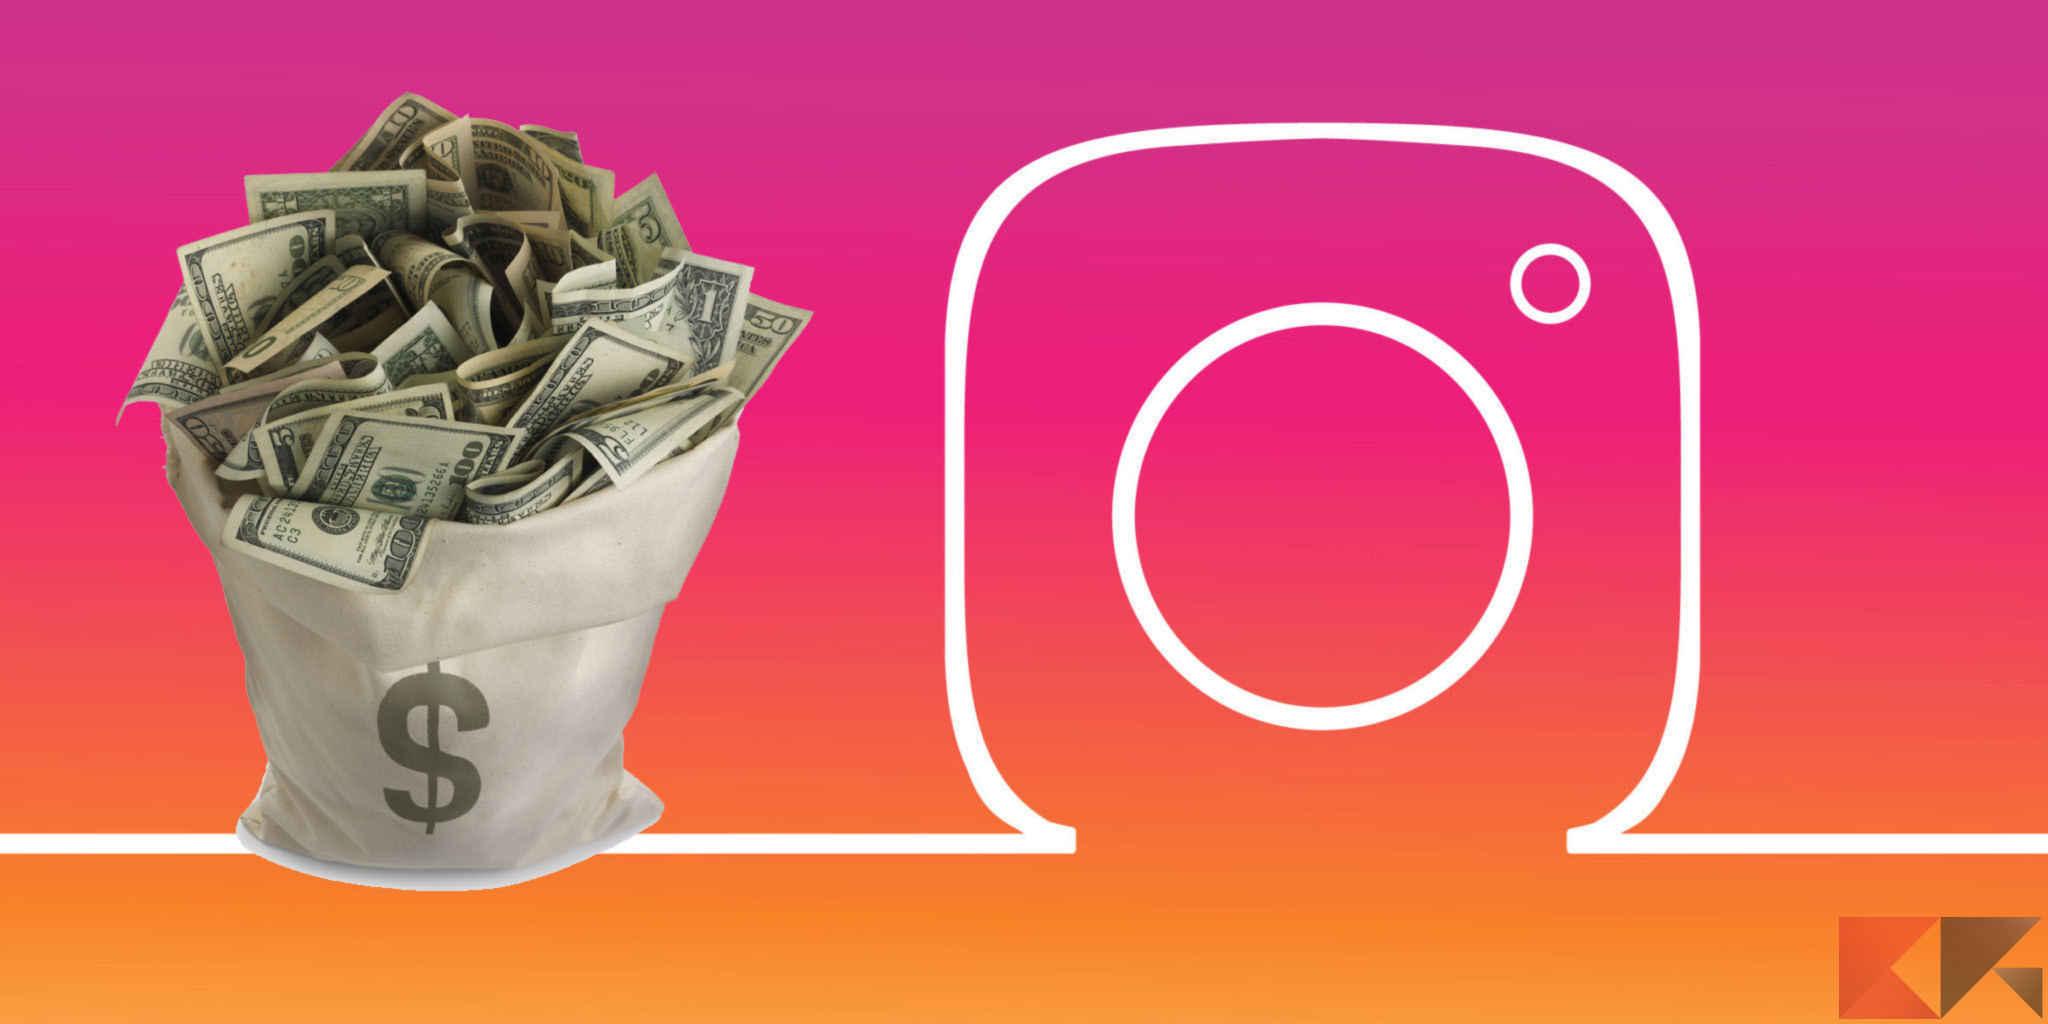 comprare follower instagram 1